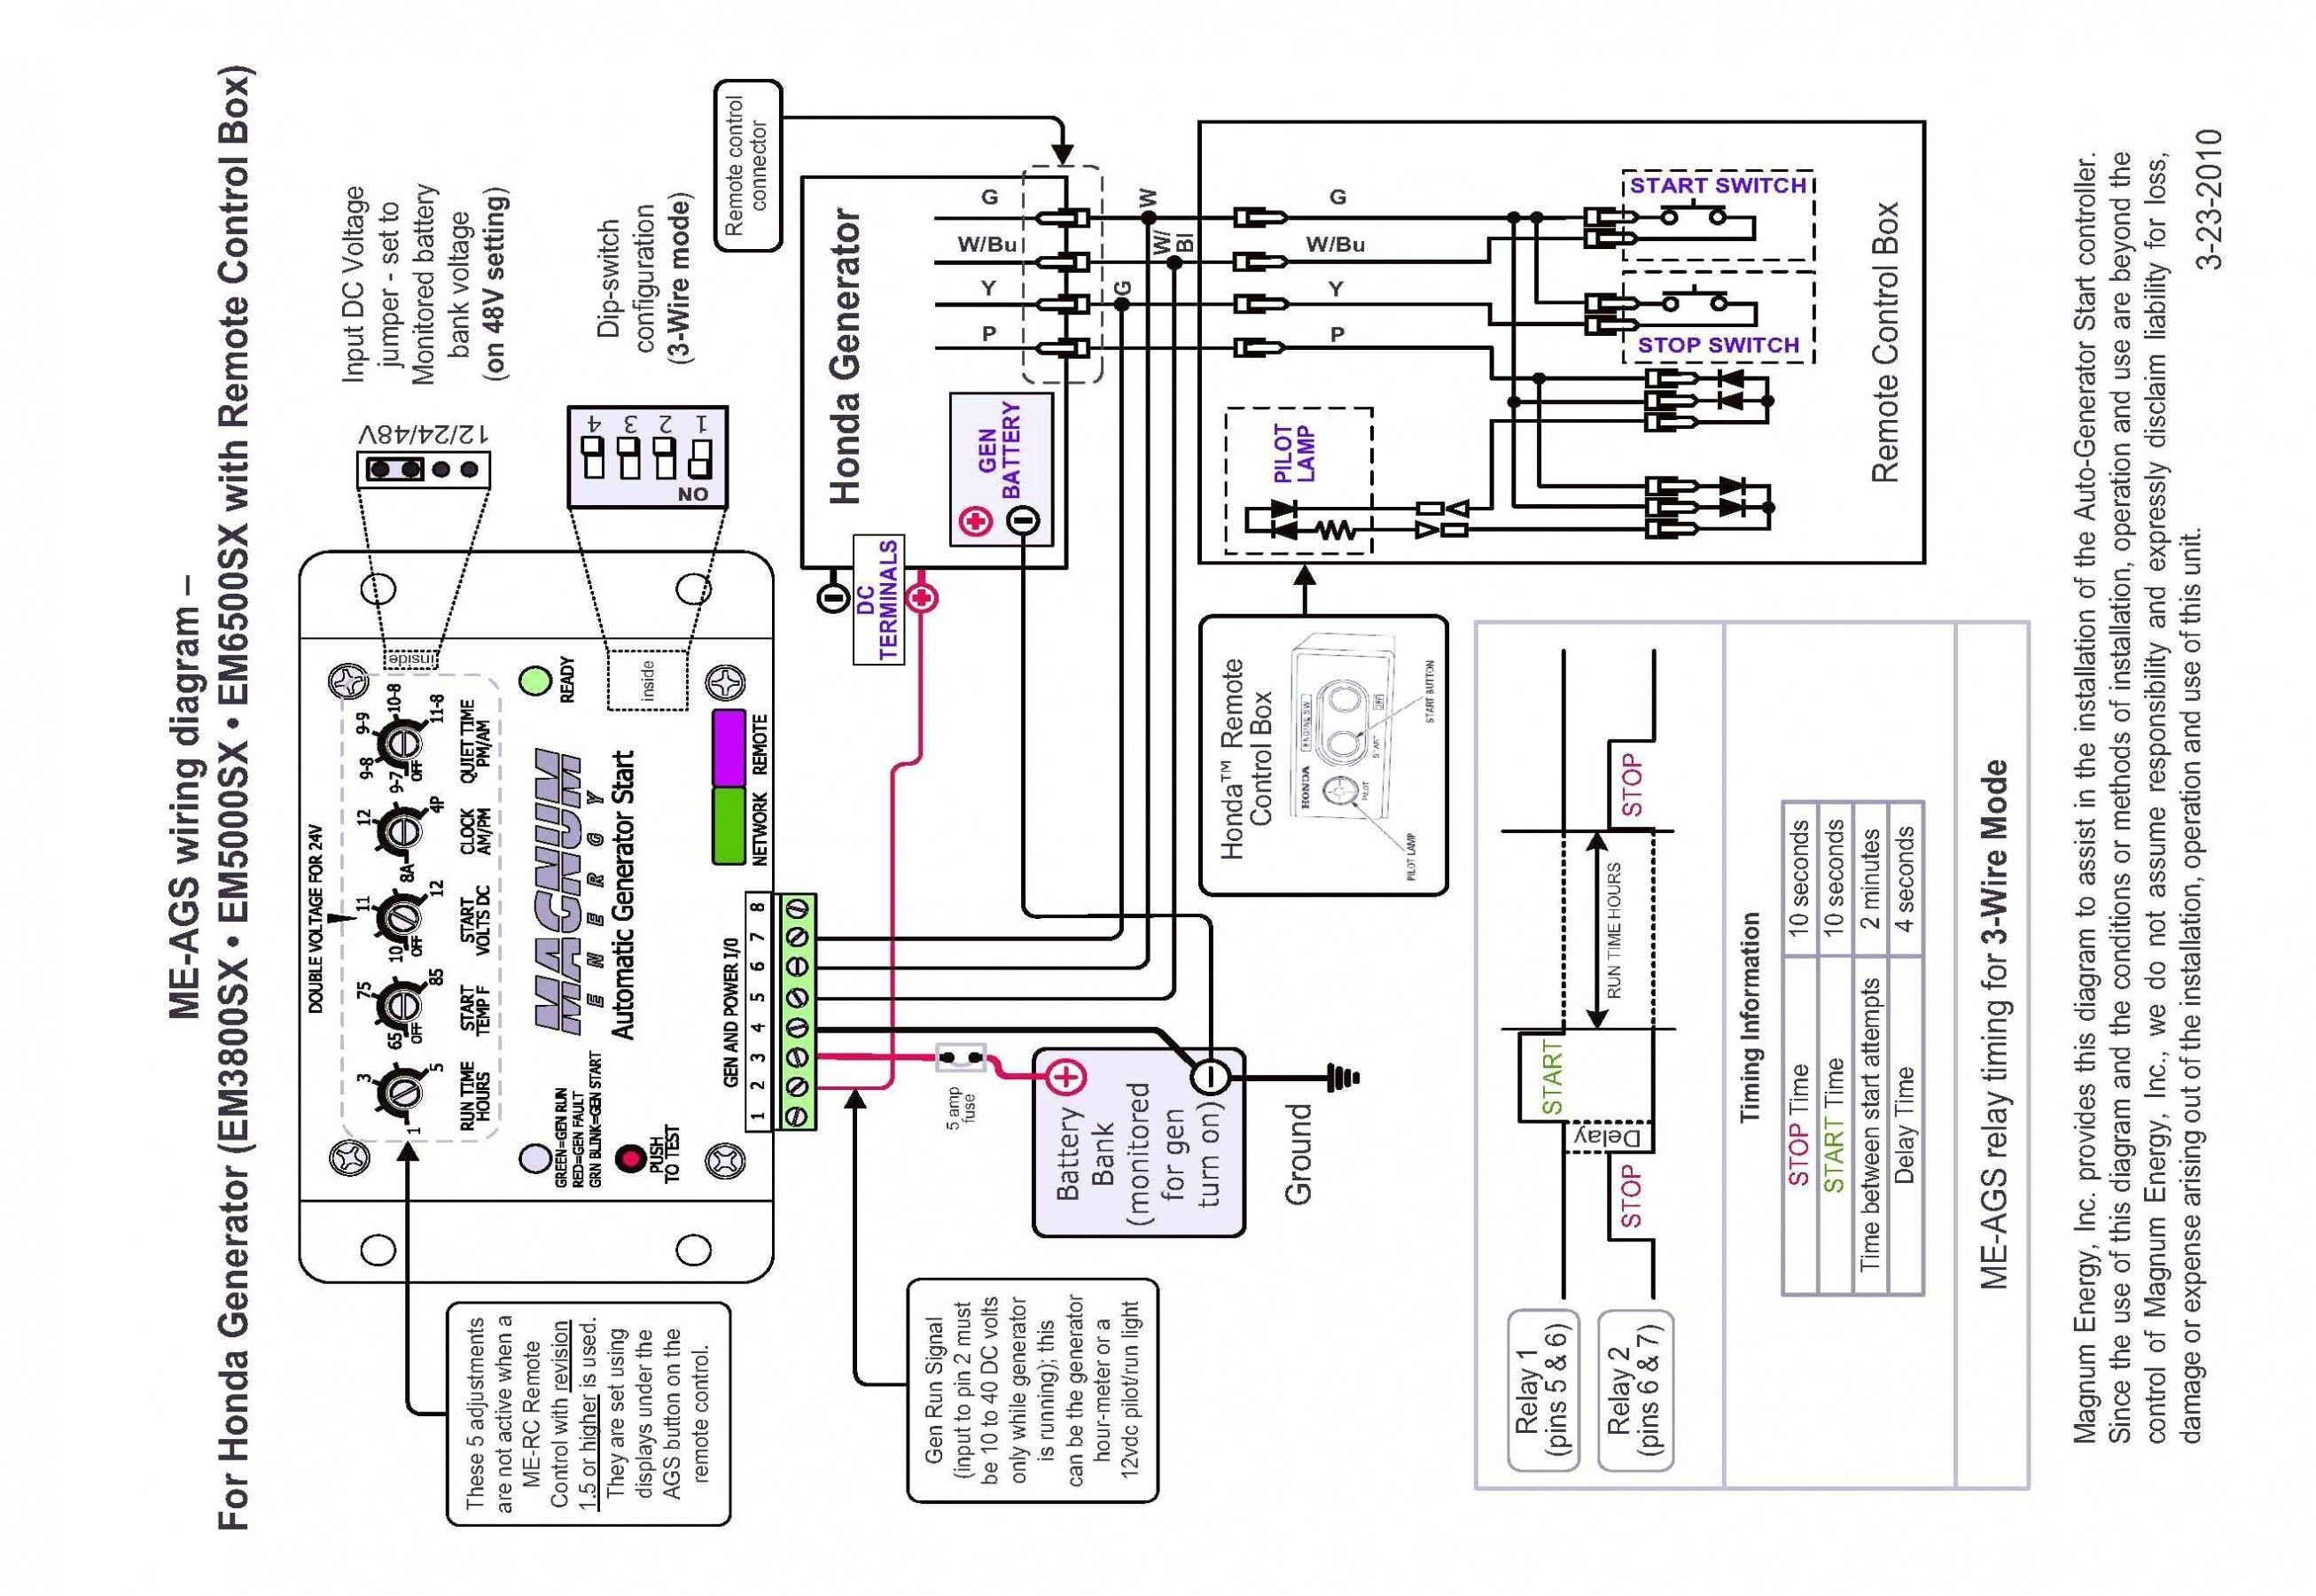 Unique Generator Transfer Wiring Diagram  Diagram  Diagramsample  Diagramtemplate Check More At